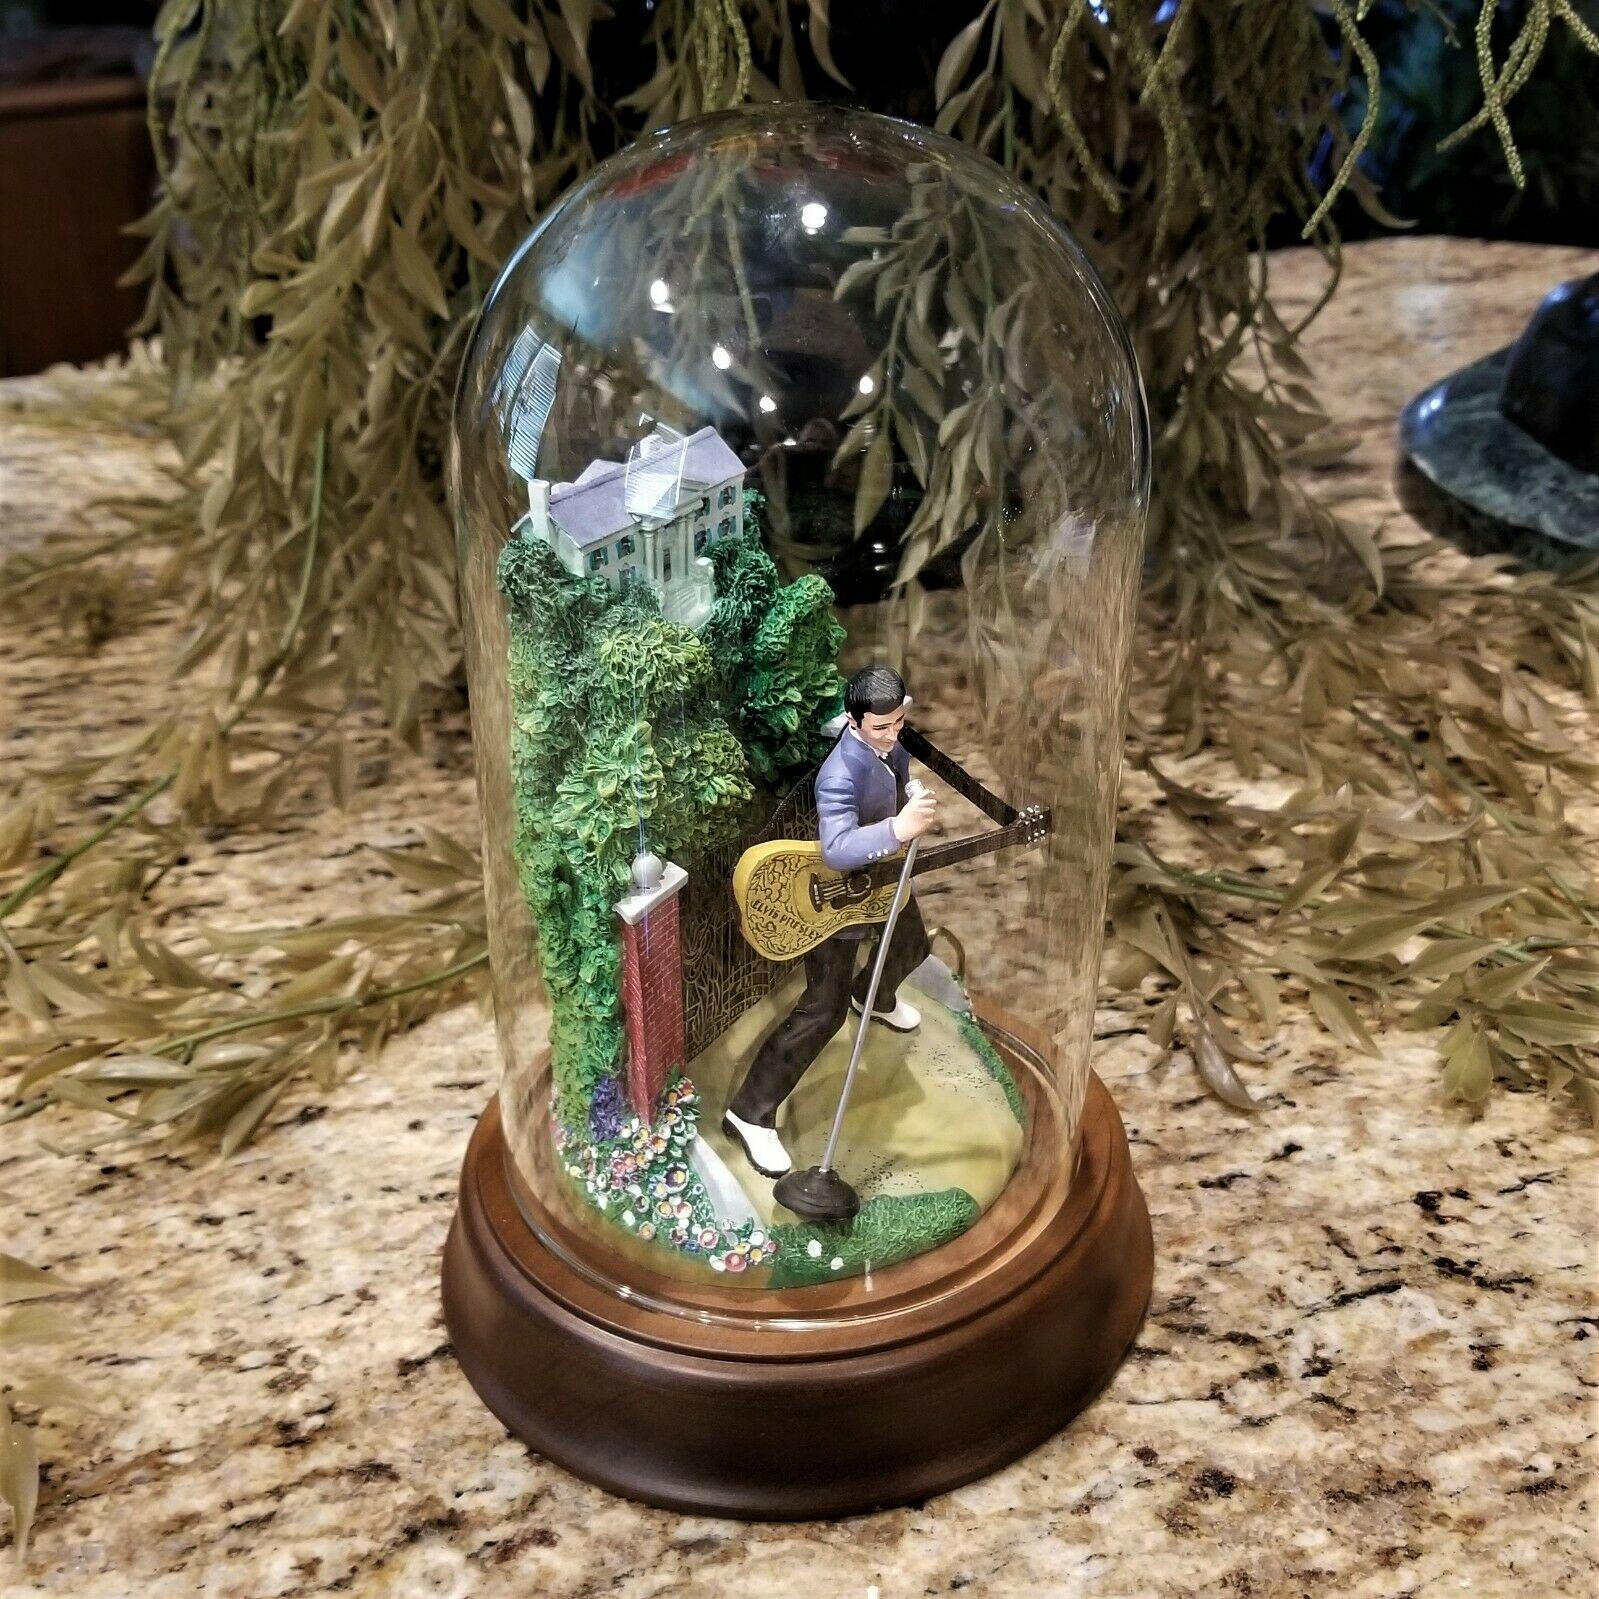 Franklin Mint Elvis Presley Graceland Love Me Tender Music Box Glass Dome Figure image 4